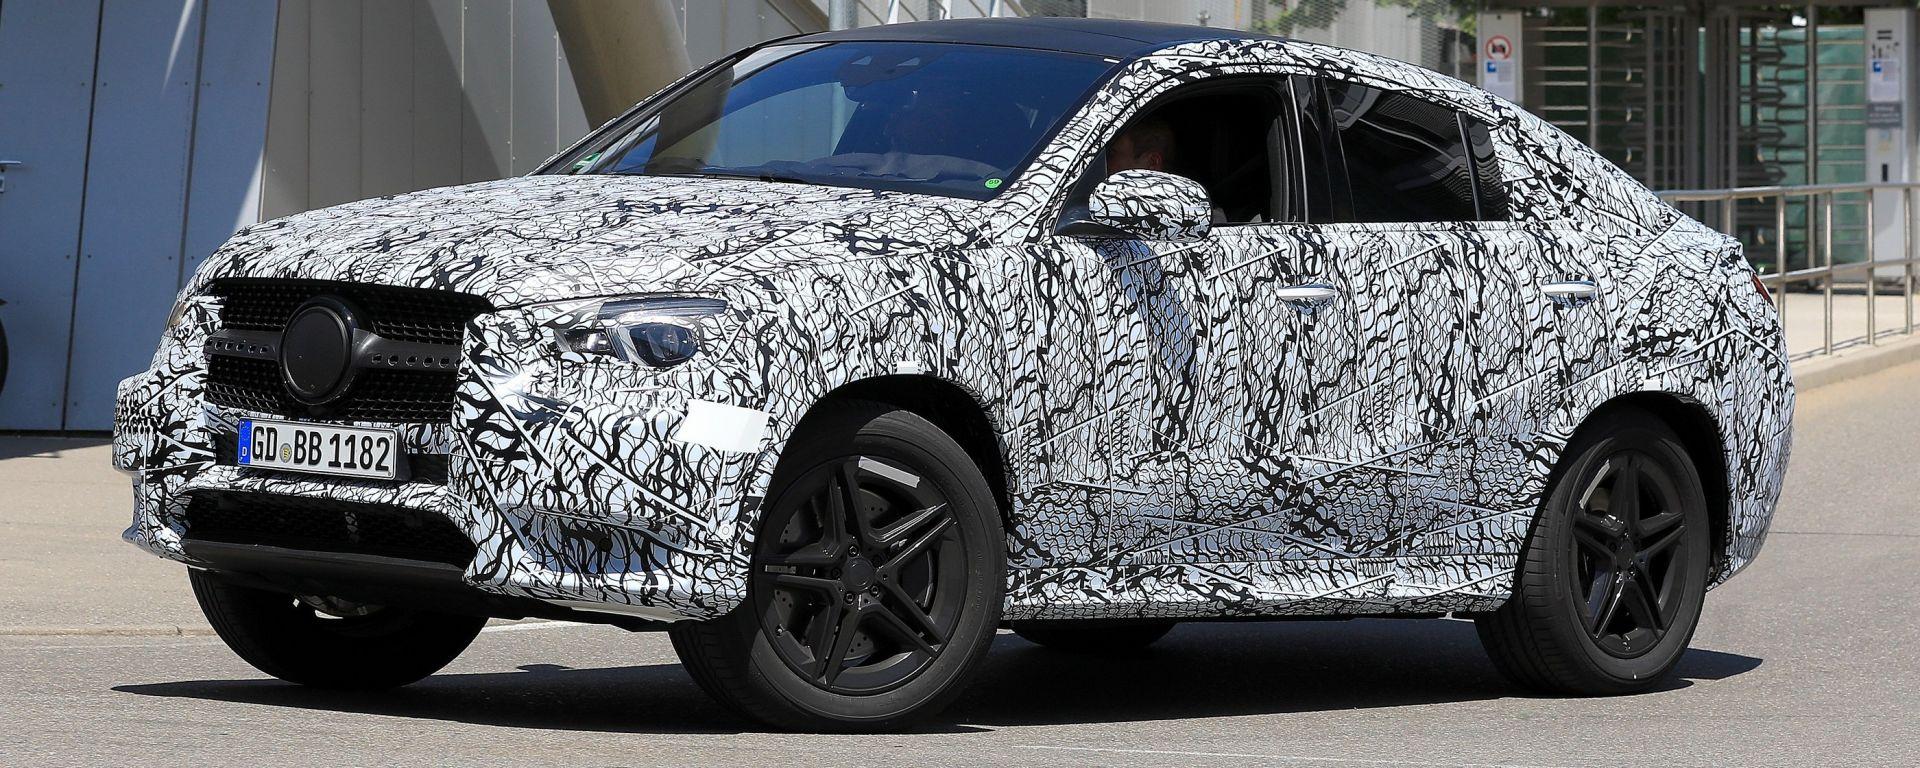 Mercedes GLE Coupé: il nuovo SUV arriva a Ginevra?